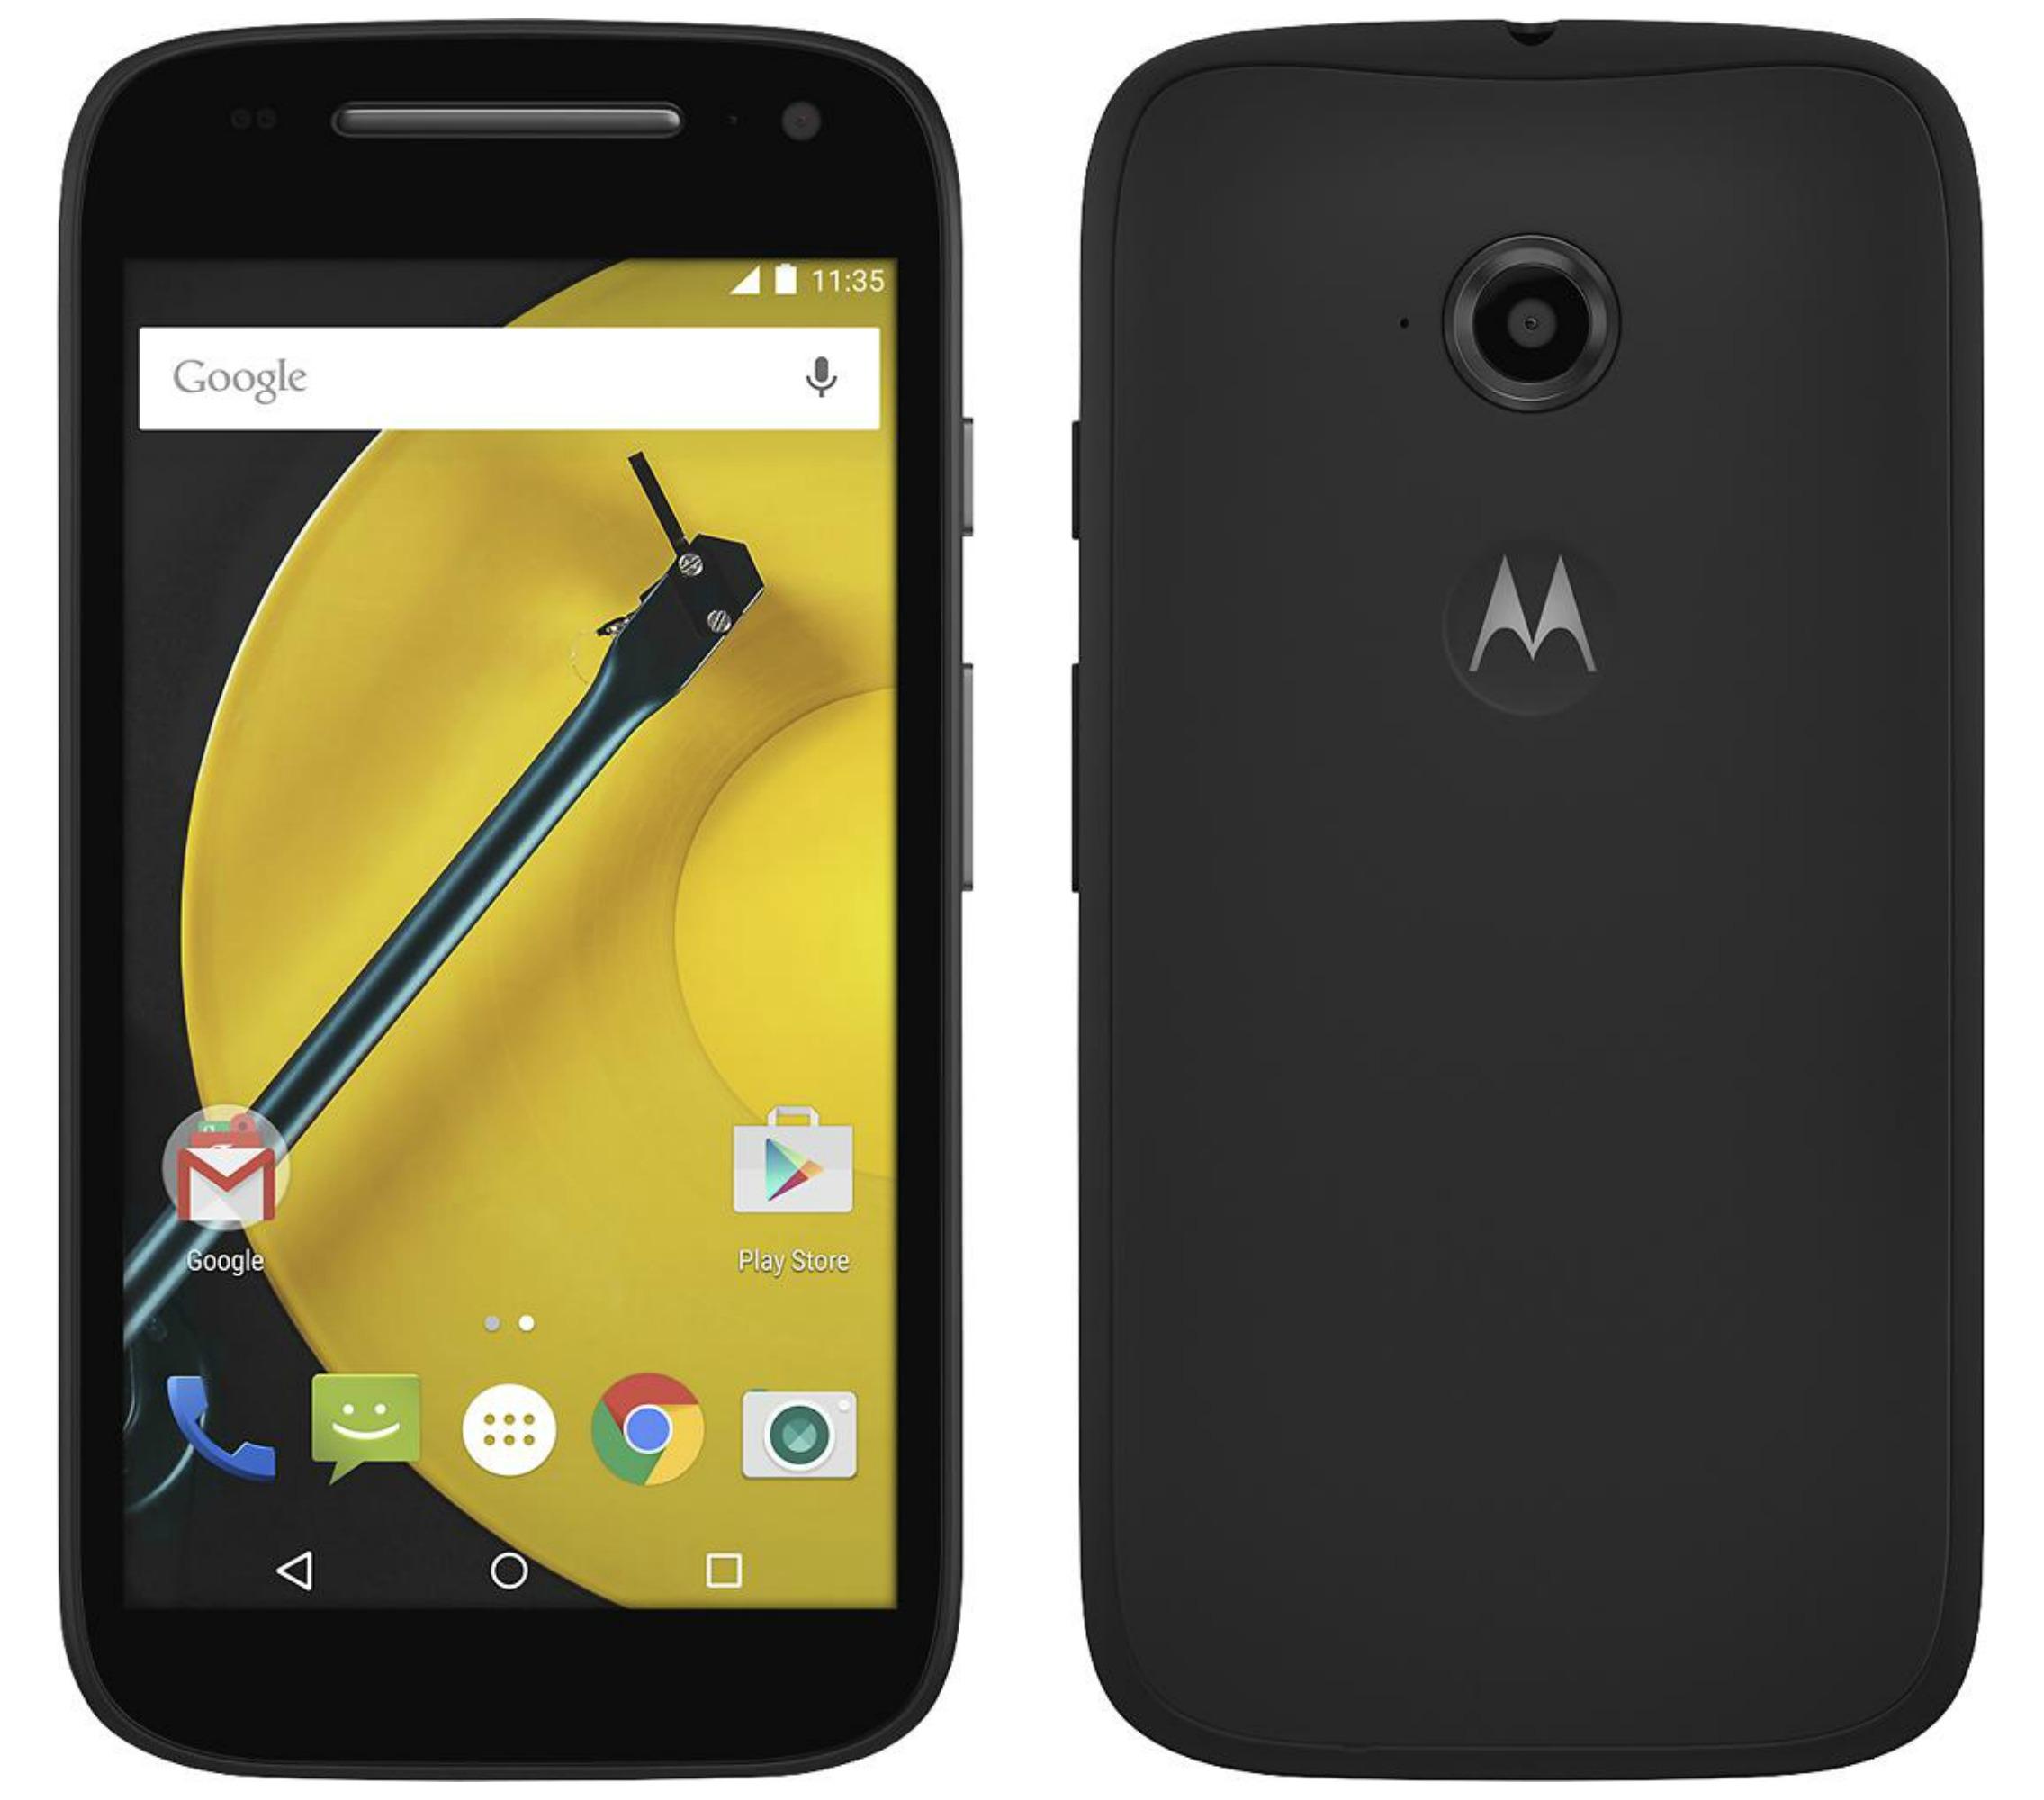 Verizon 4G Lte Smartphone Reviews